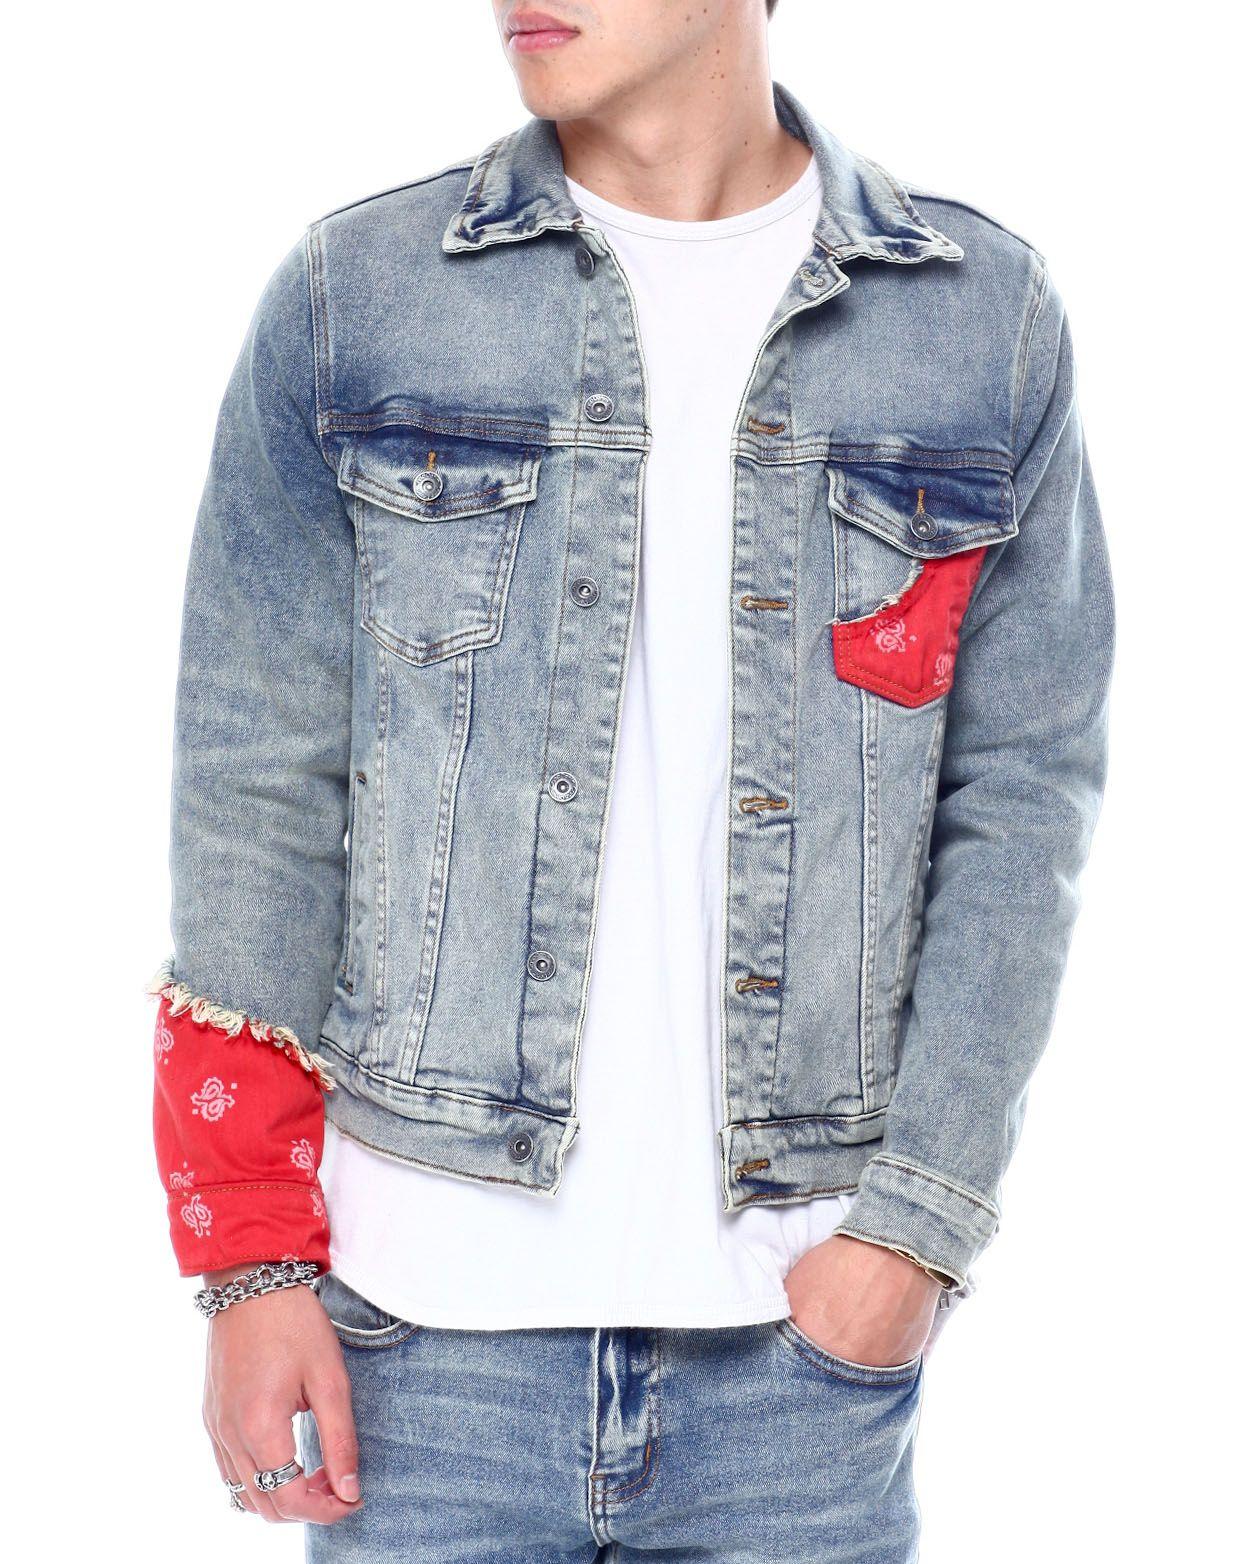 Red Bandana Denim Jacket Denim Jacket Skirt And Sneakers Denim Jacket Men [ 1564 x 1251 Pixel ]